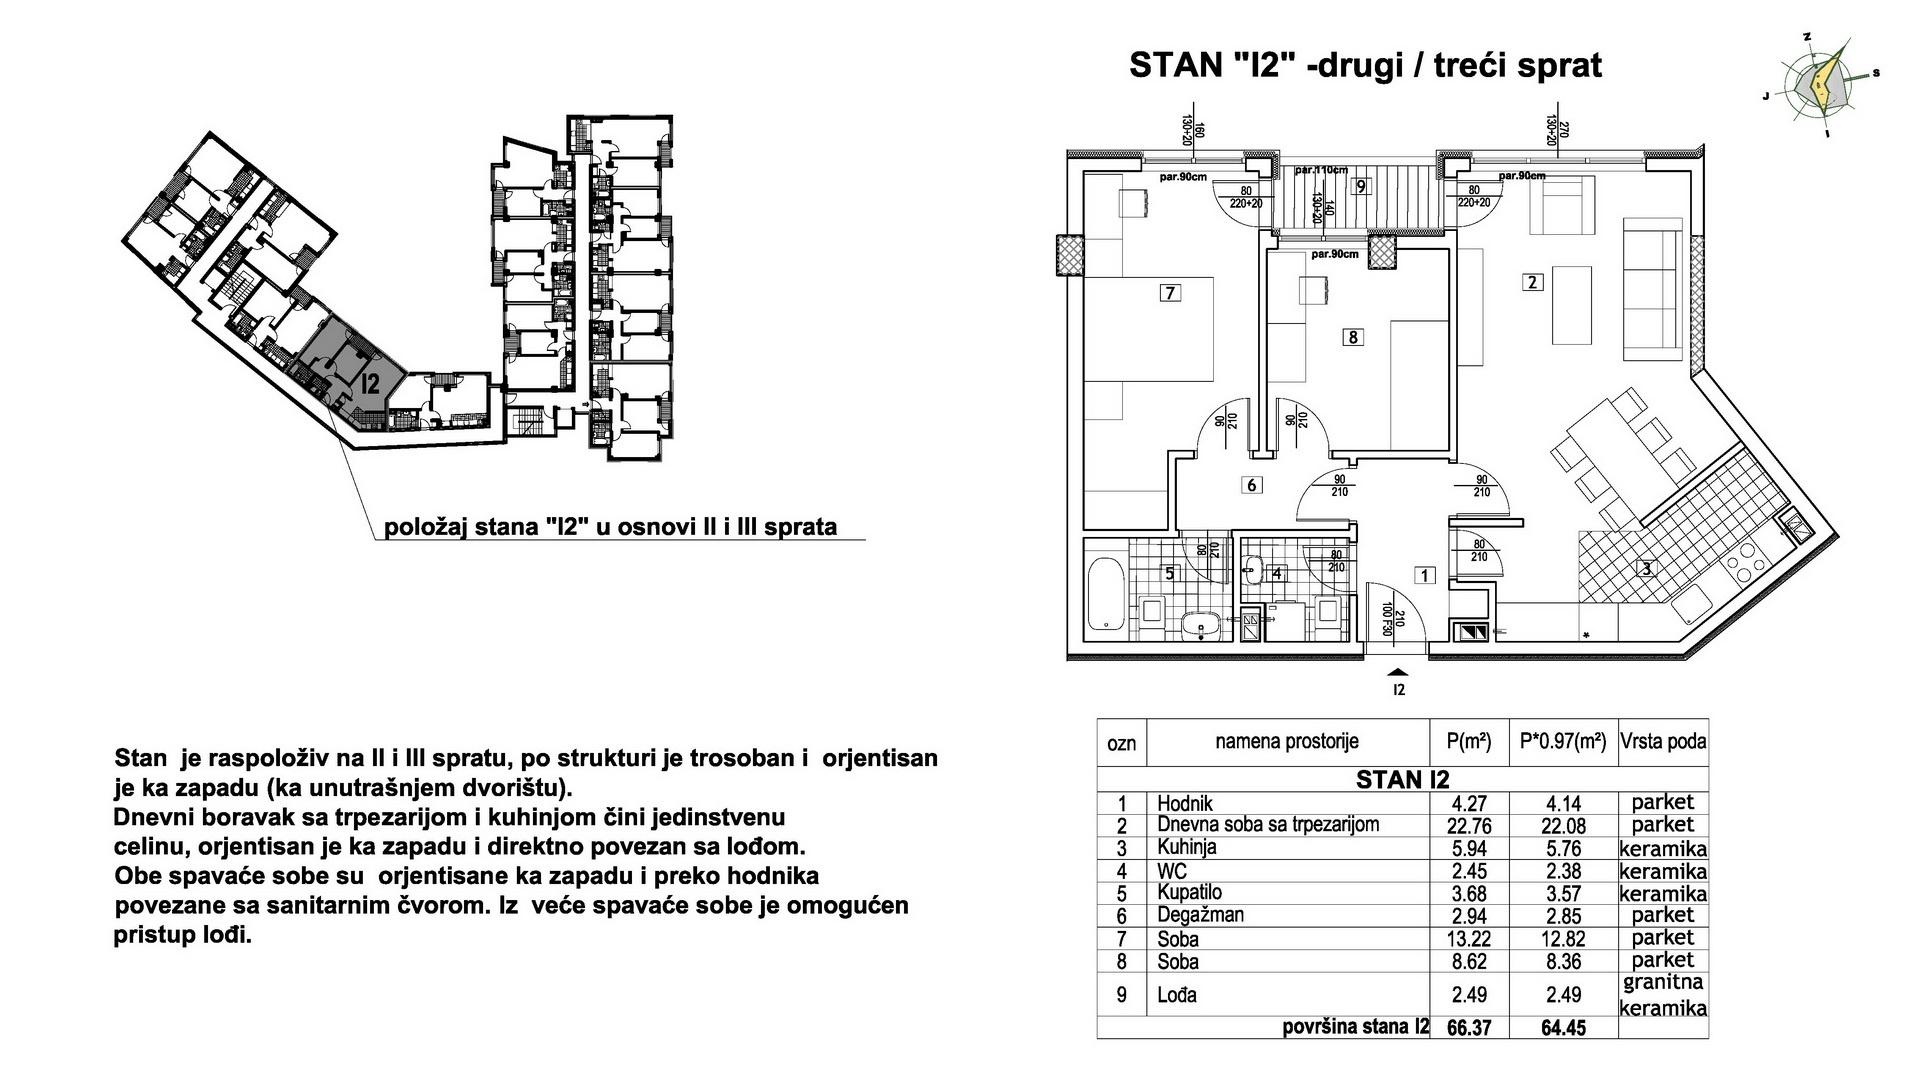 Objekat u Prešernovoj bb - Stan I2